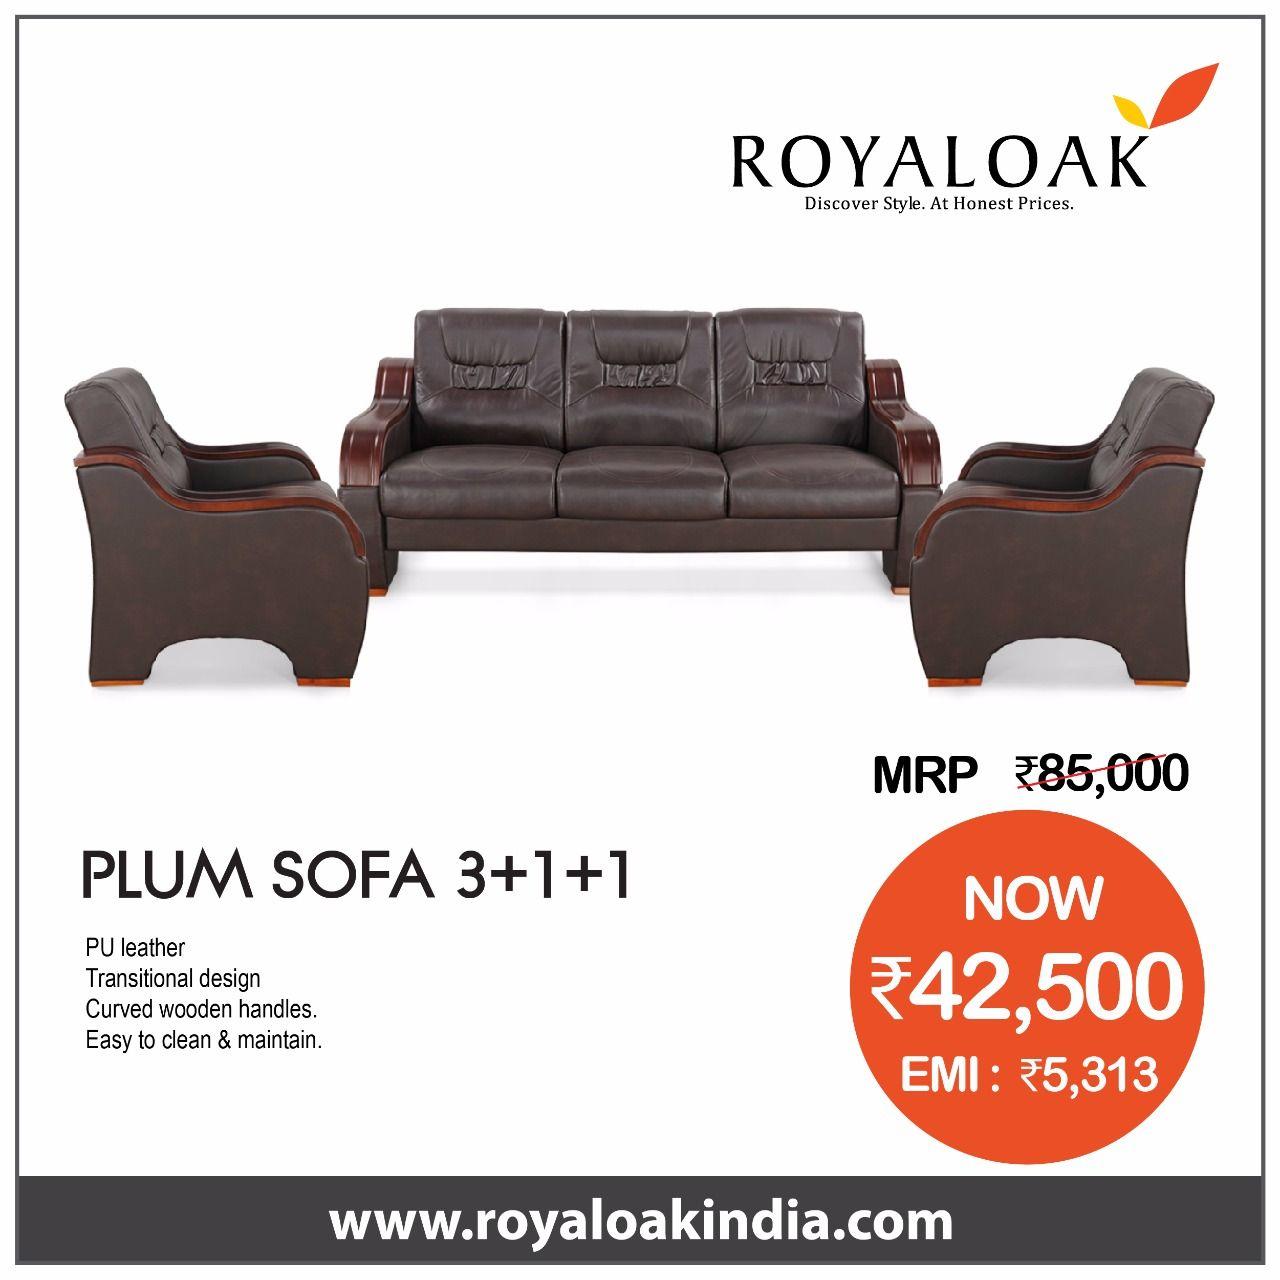 Pin By Royaloak Furniture On Royaloak Sofa Sets Buy Furniture Online Buying Furniture Online Furniture